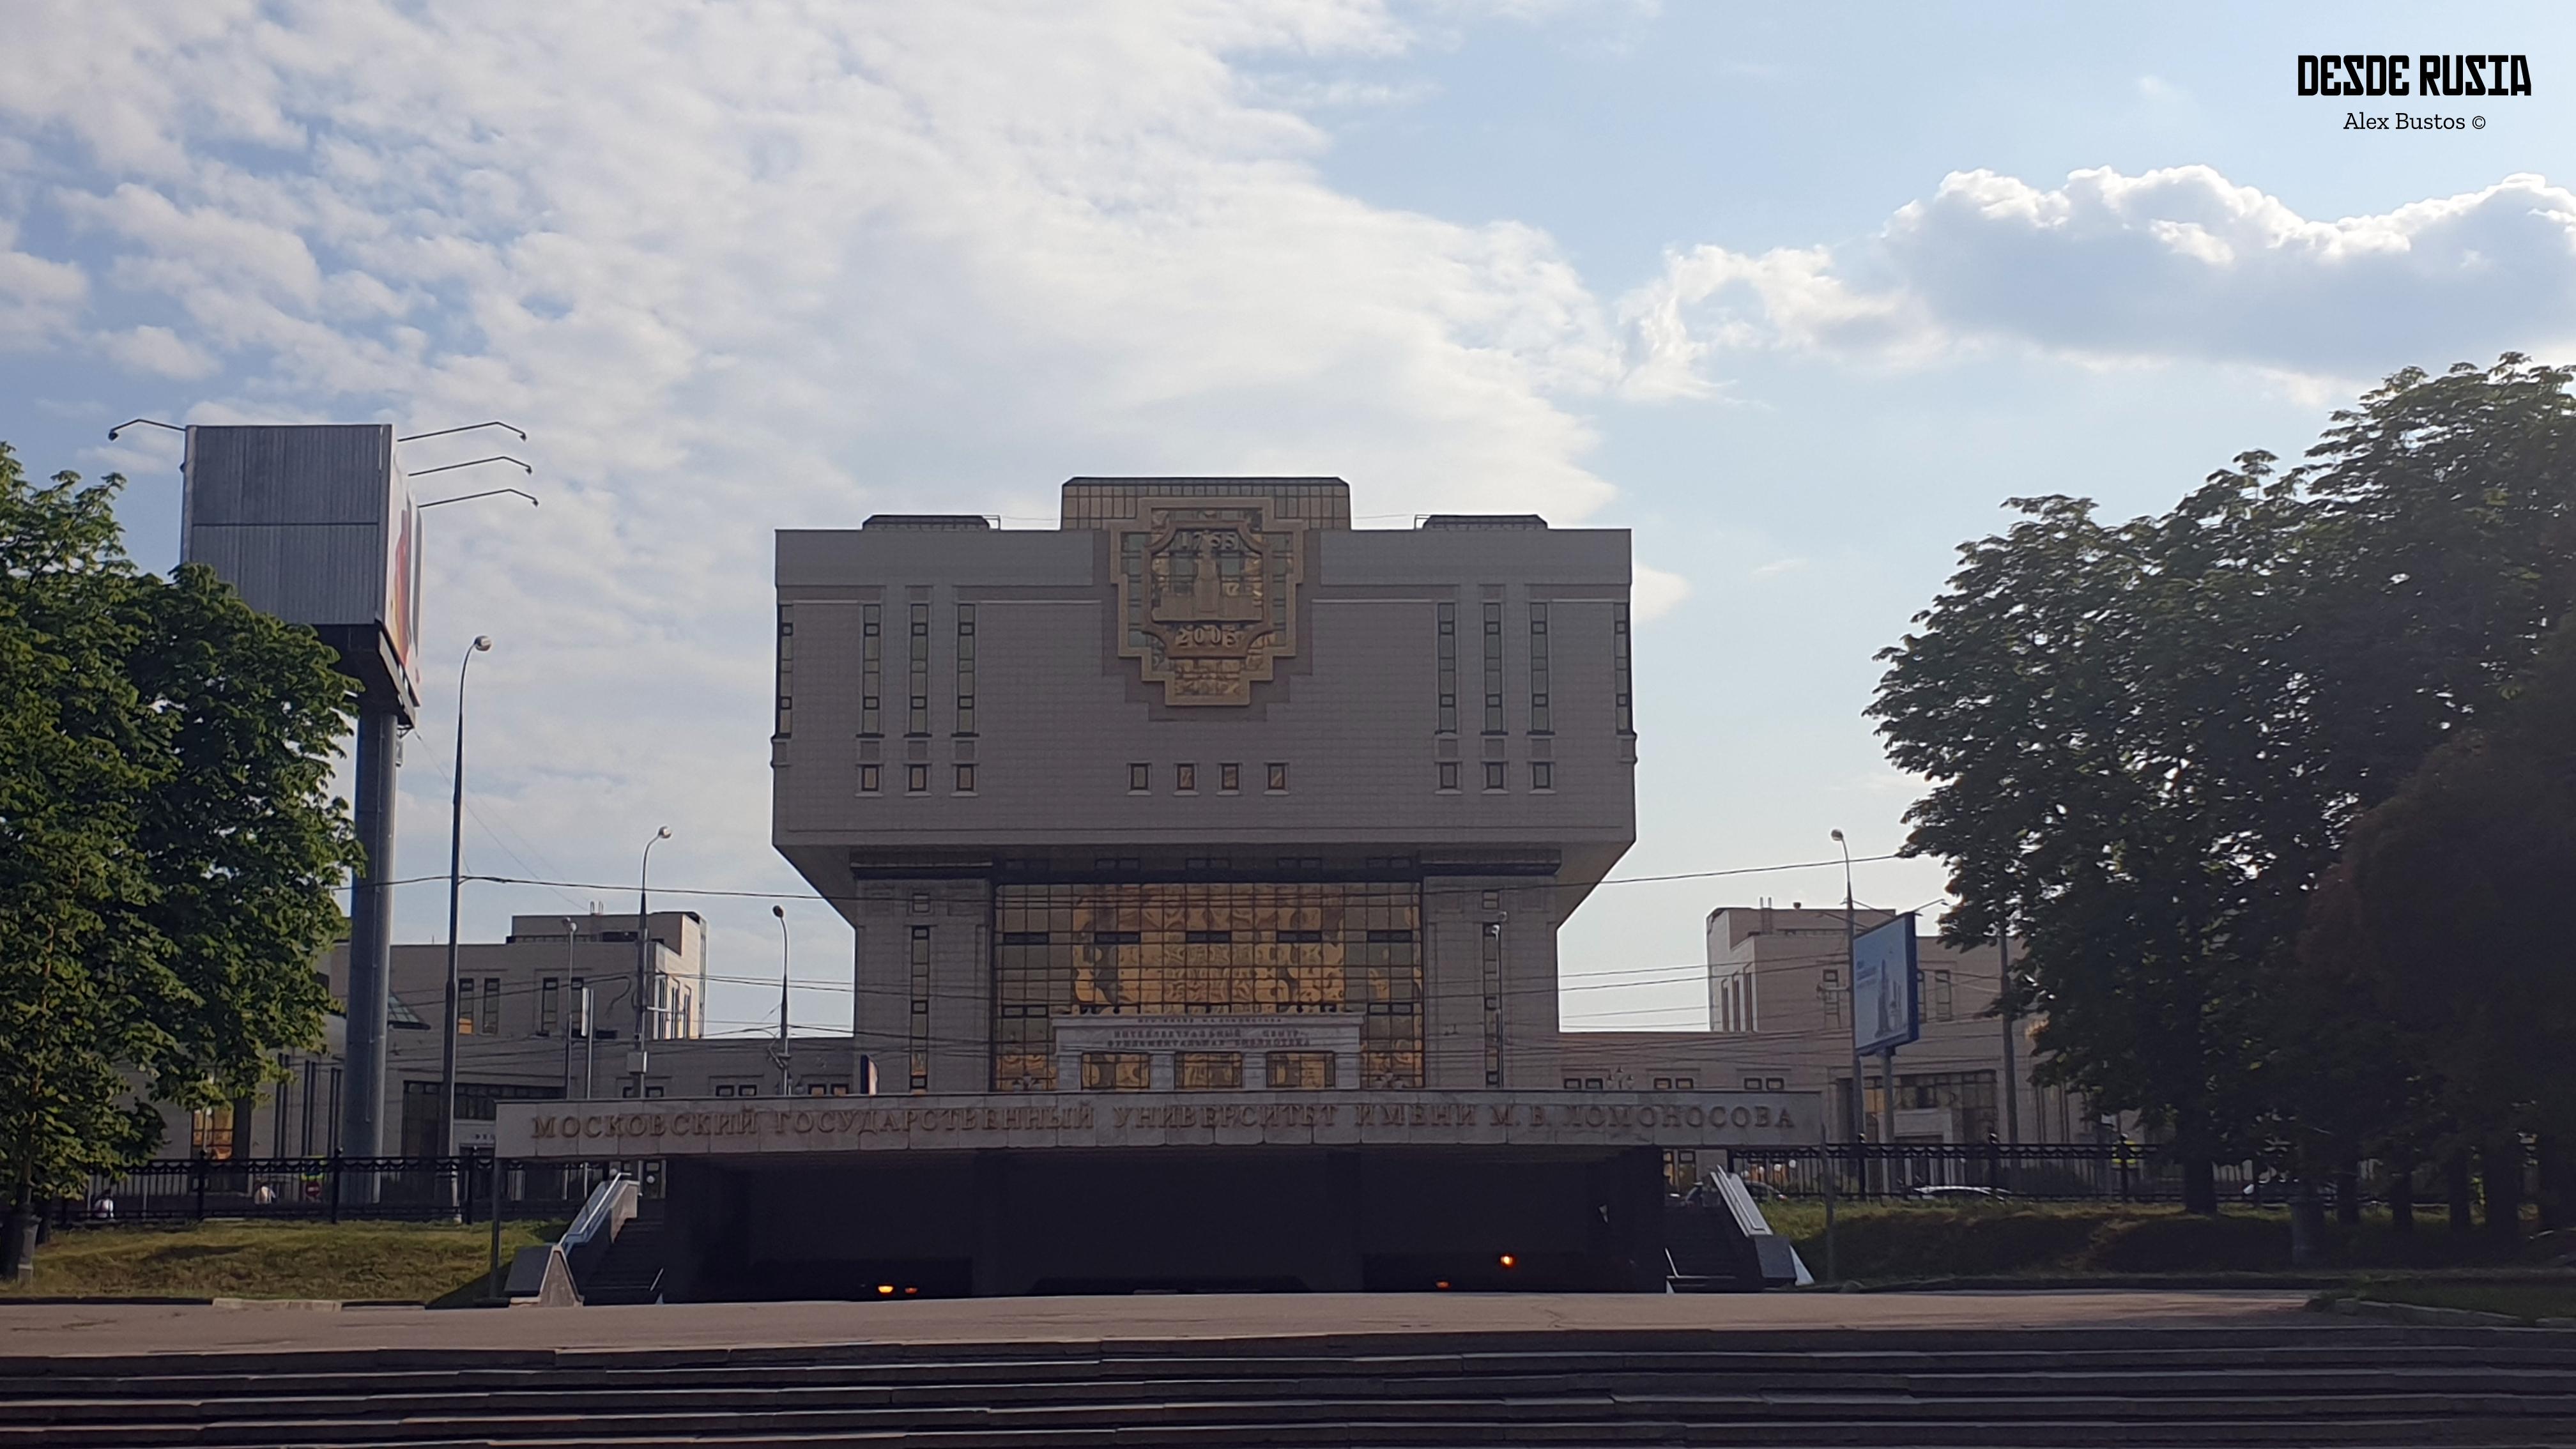 Biblioteca de la Universitat de Moscou